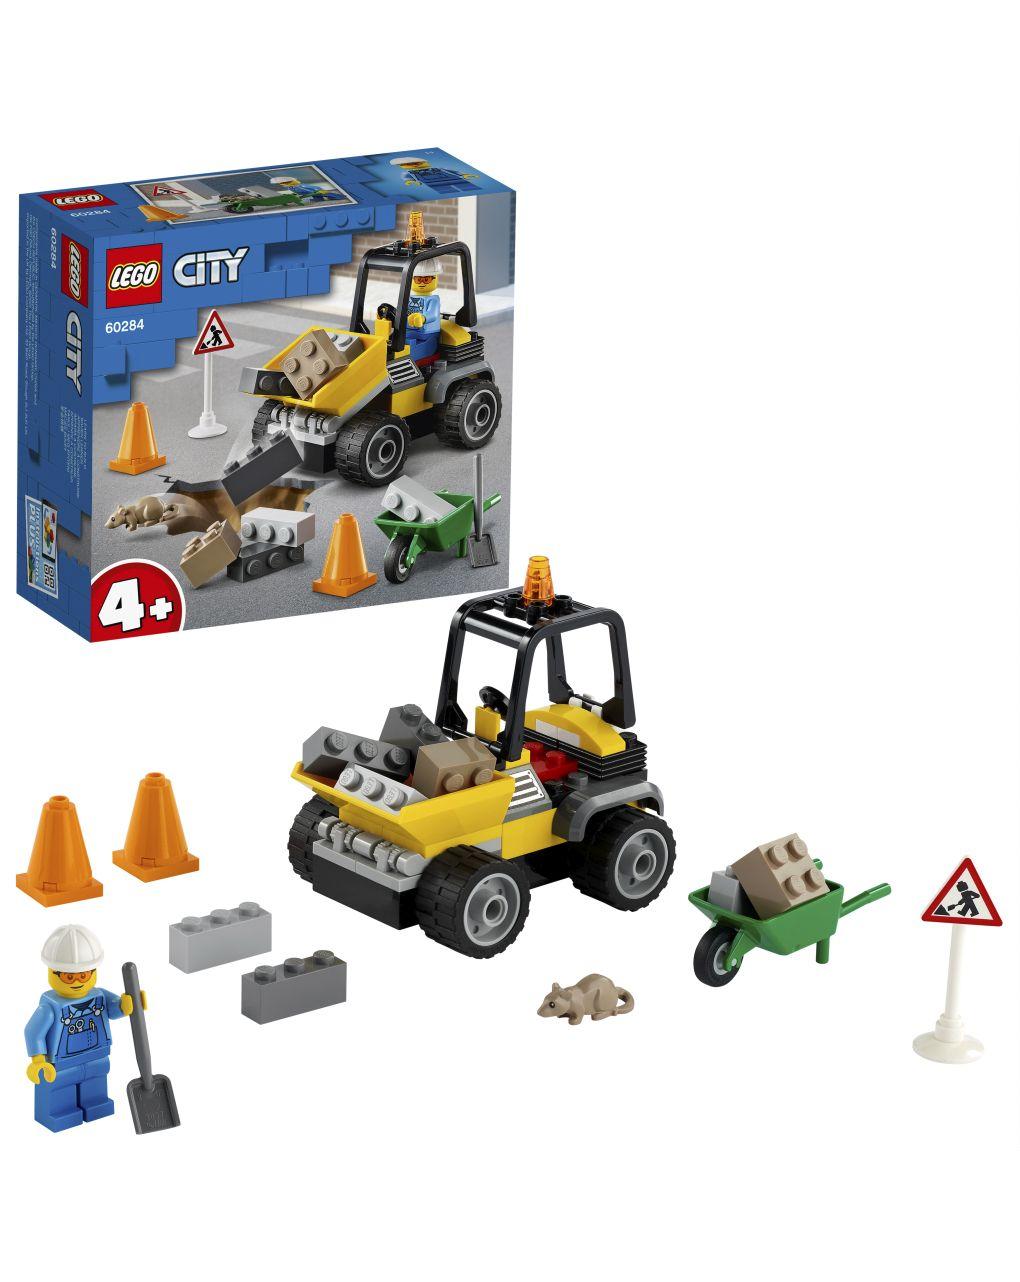 Lego city great vehicles - ruspa da cantiere - 60284 - LEGO